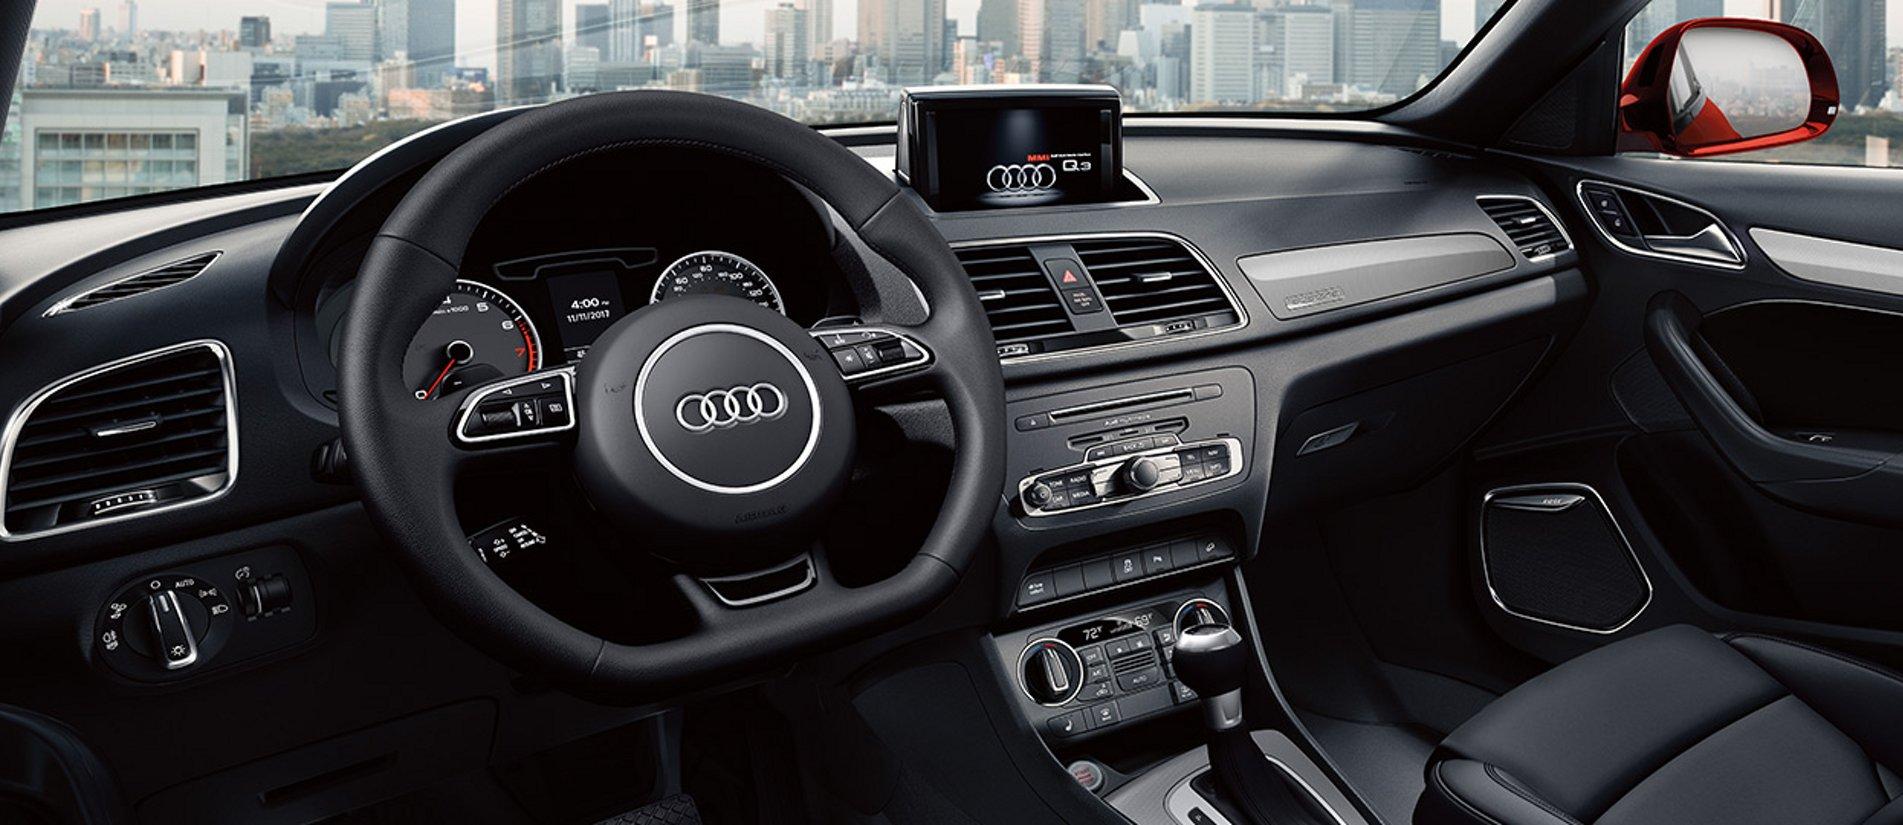 Audi Q For Sale In Austin TX Bentley Of Austin - Austin audi